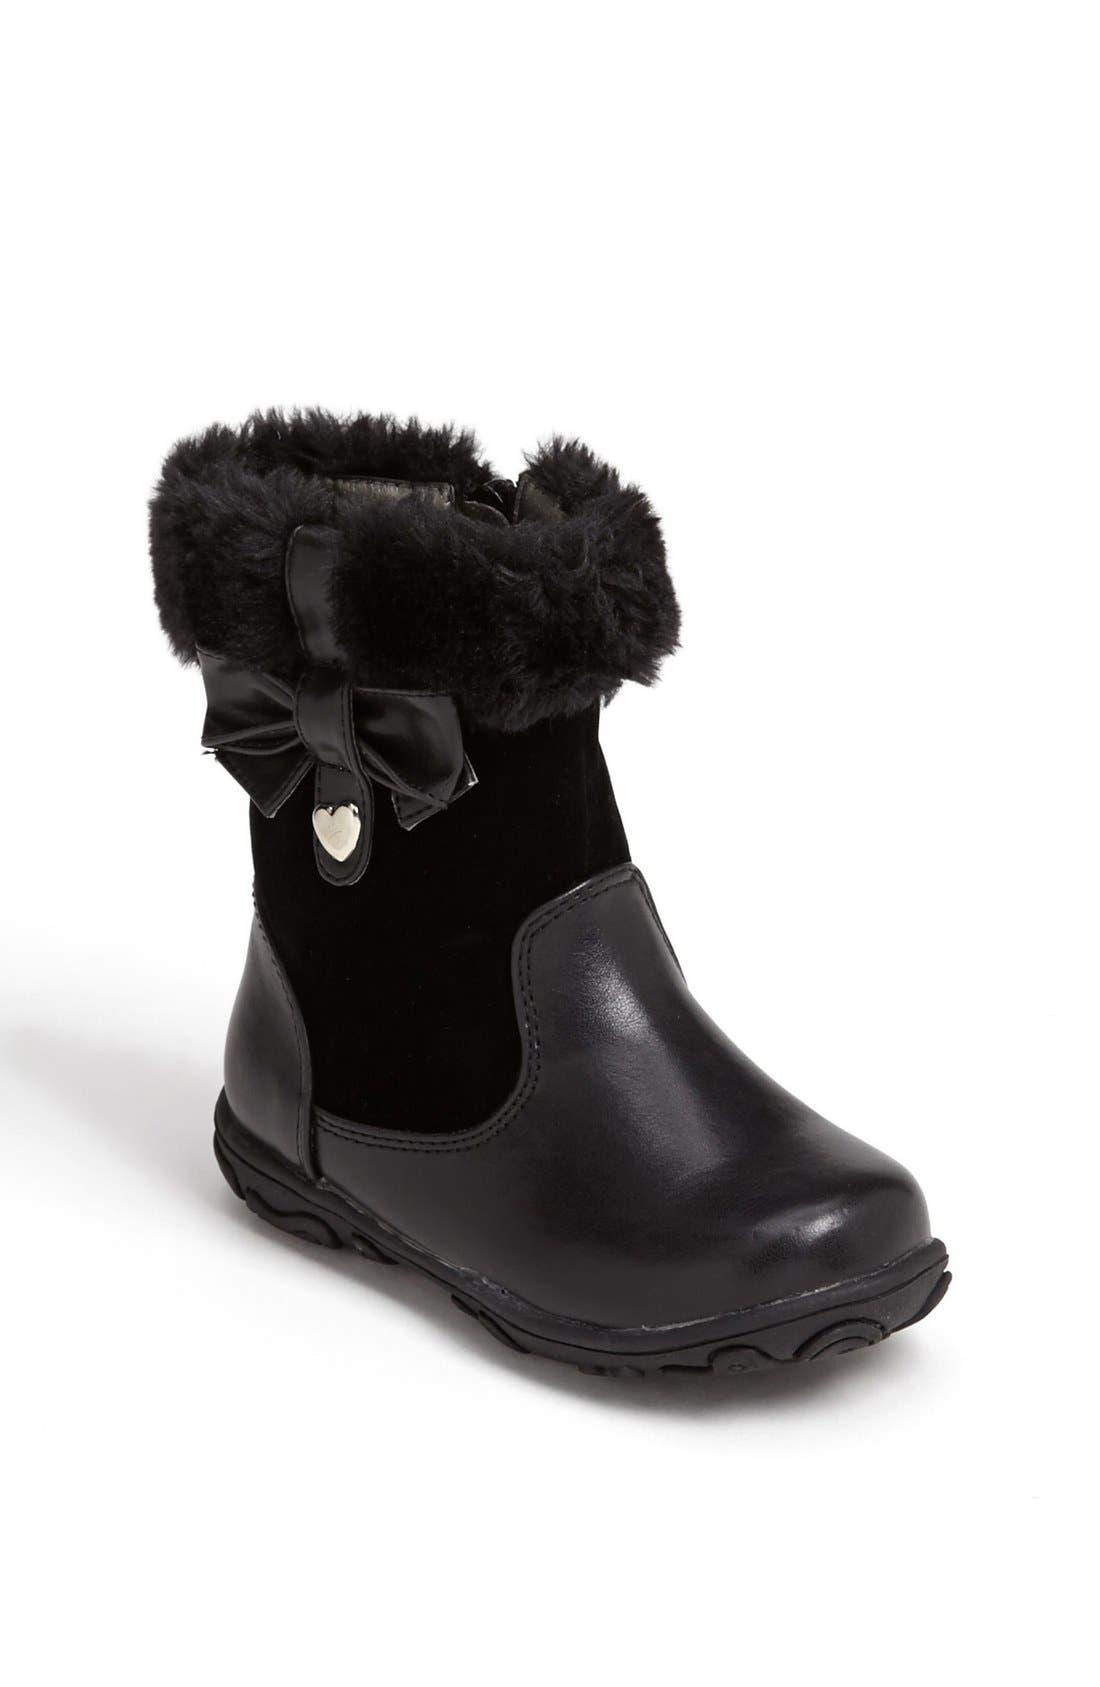 Alternate Image 1 Selected - Laura Ashley 'Bow' Boot (Walker & Toddler)